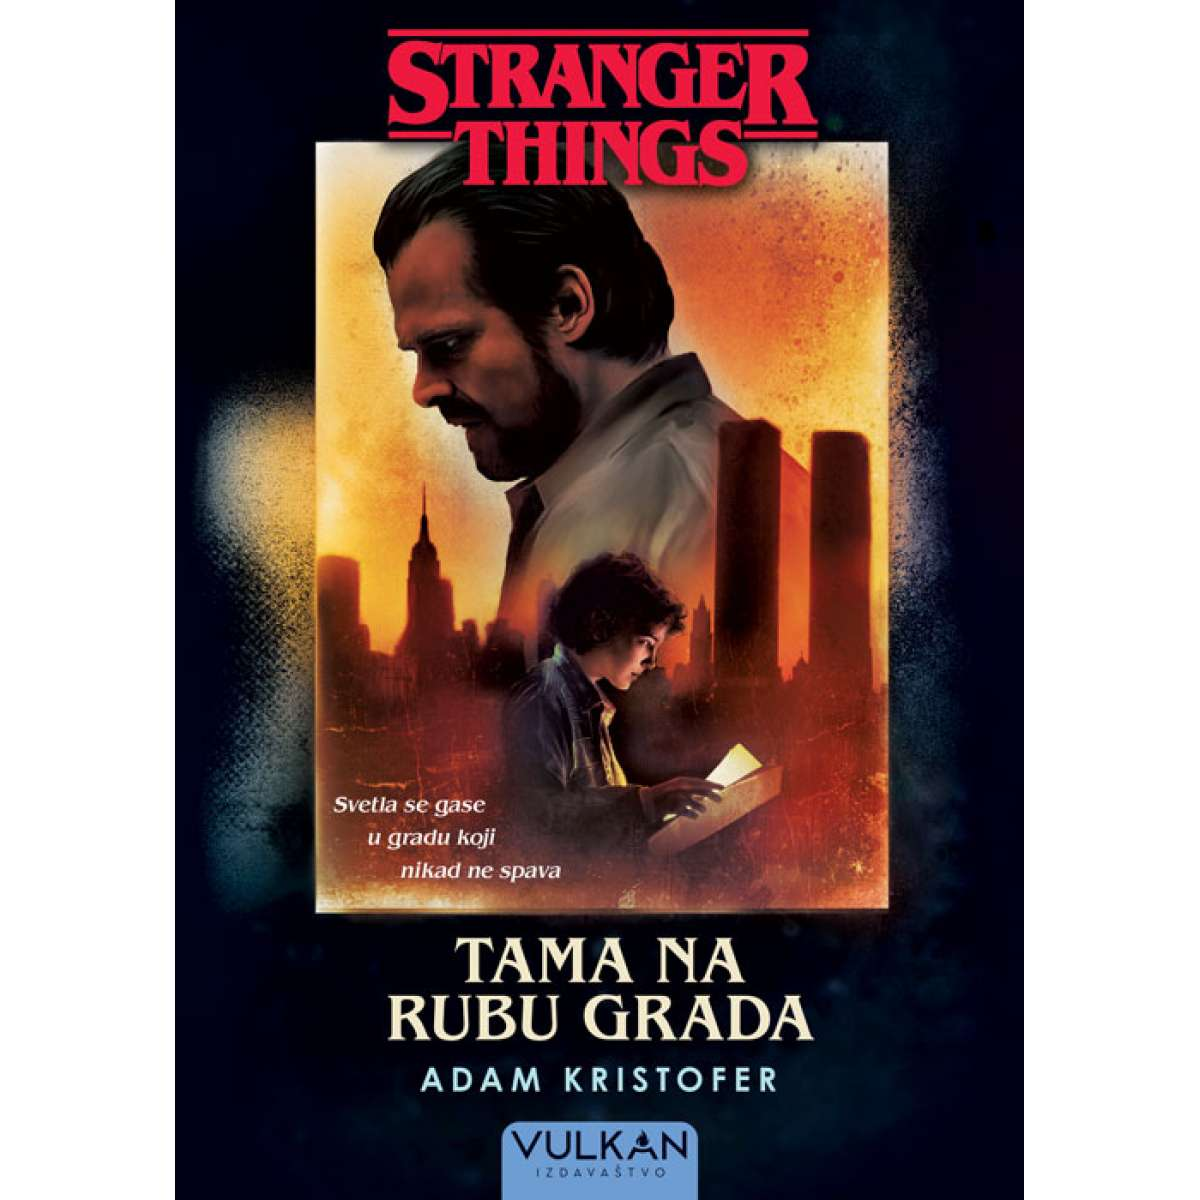 STRANGER THINGS: TAMA NA RUBU GRADA